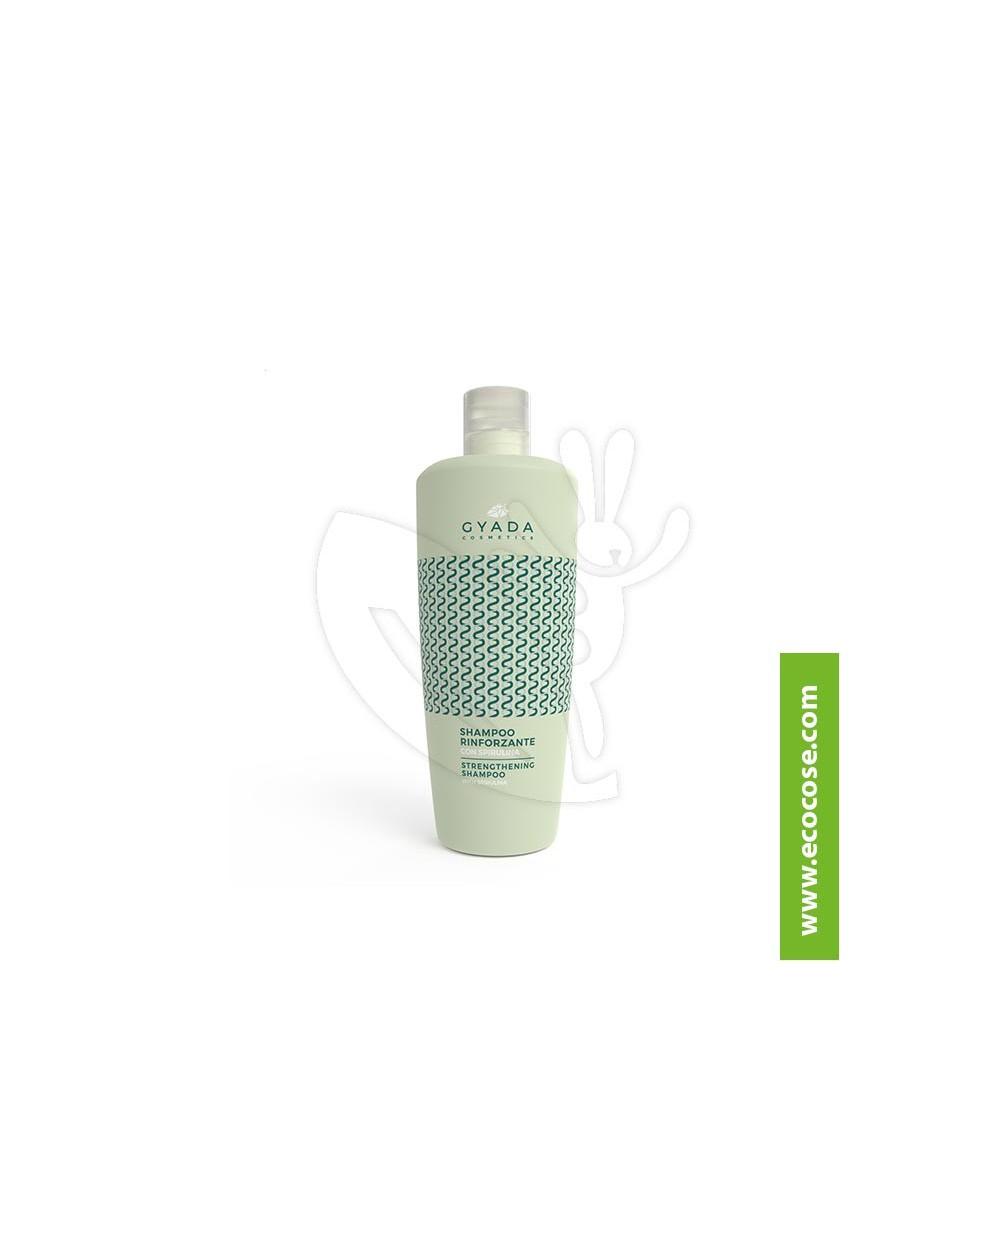 Gyada Cosmetics - Shampoo rinforzante alla spirulina